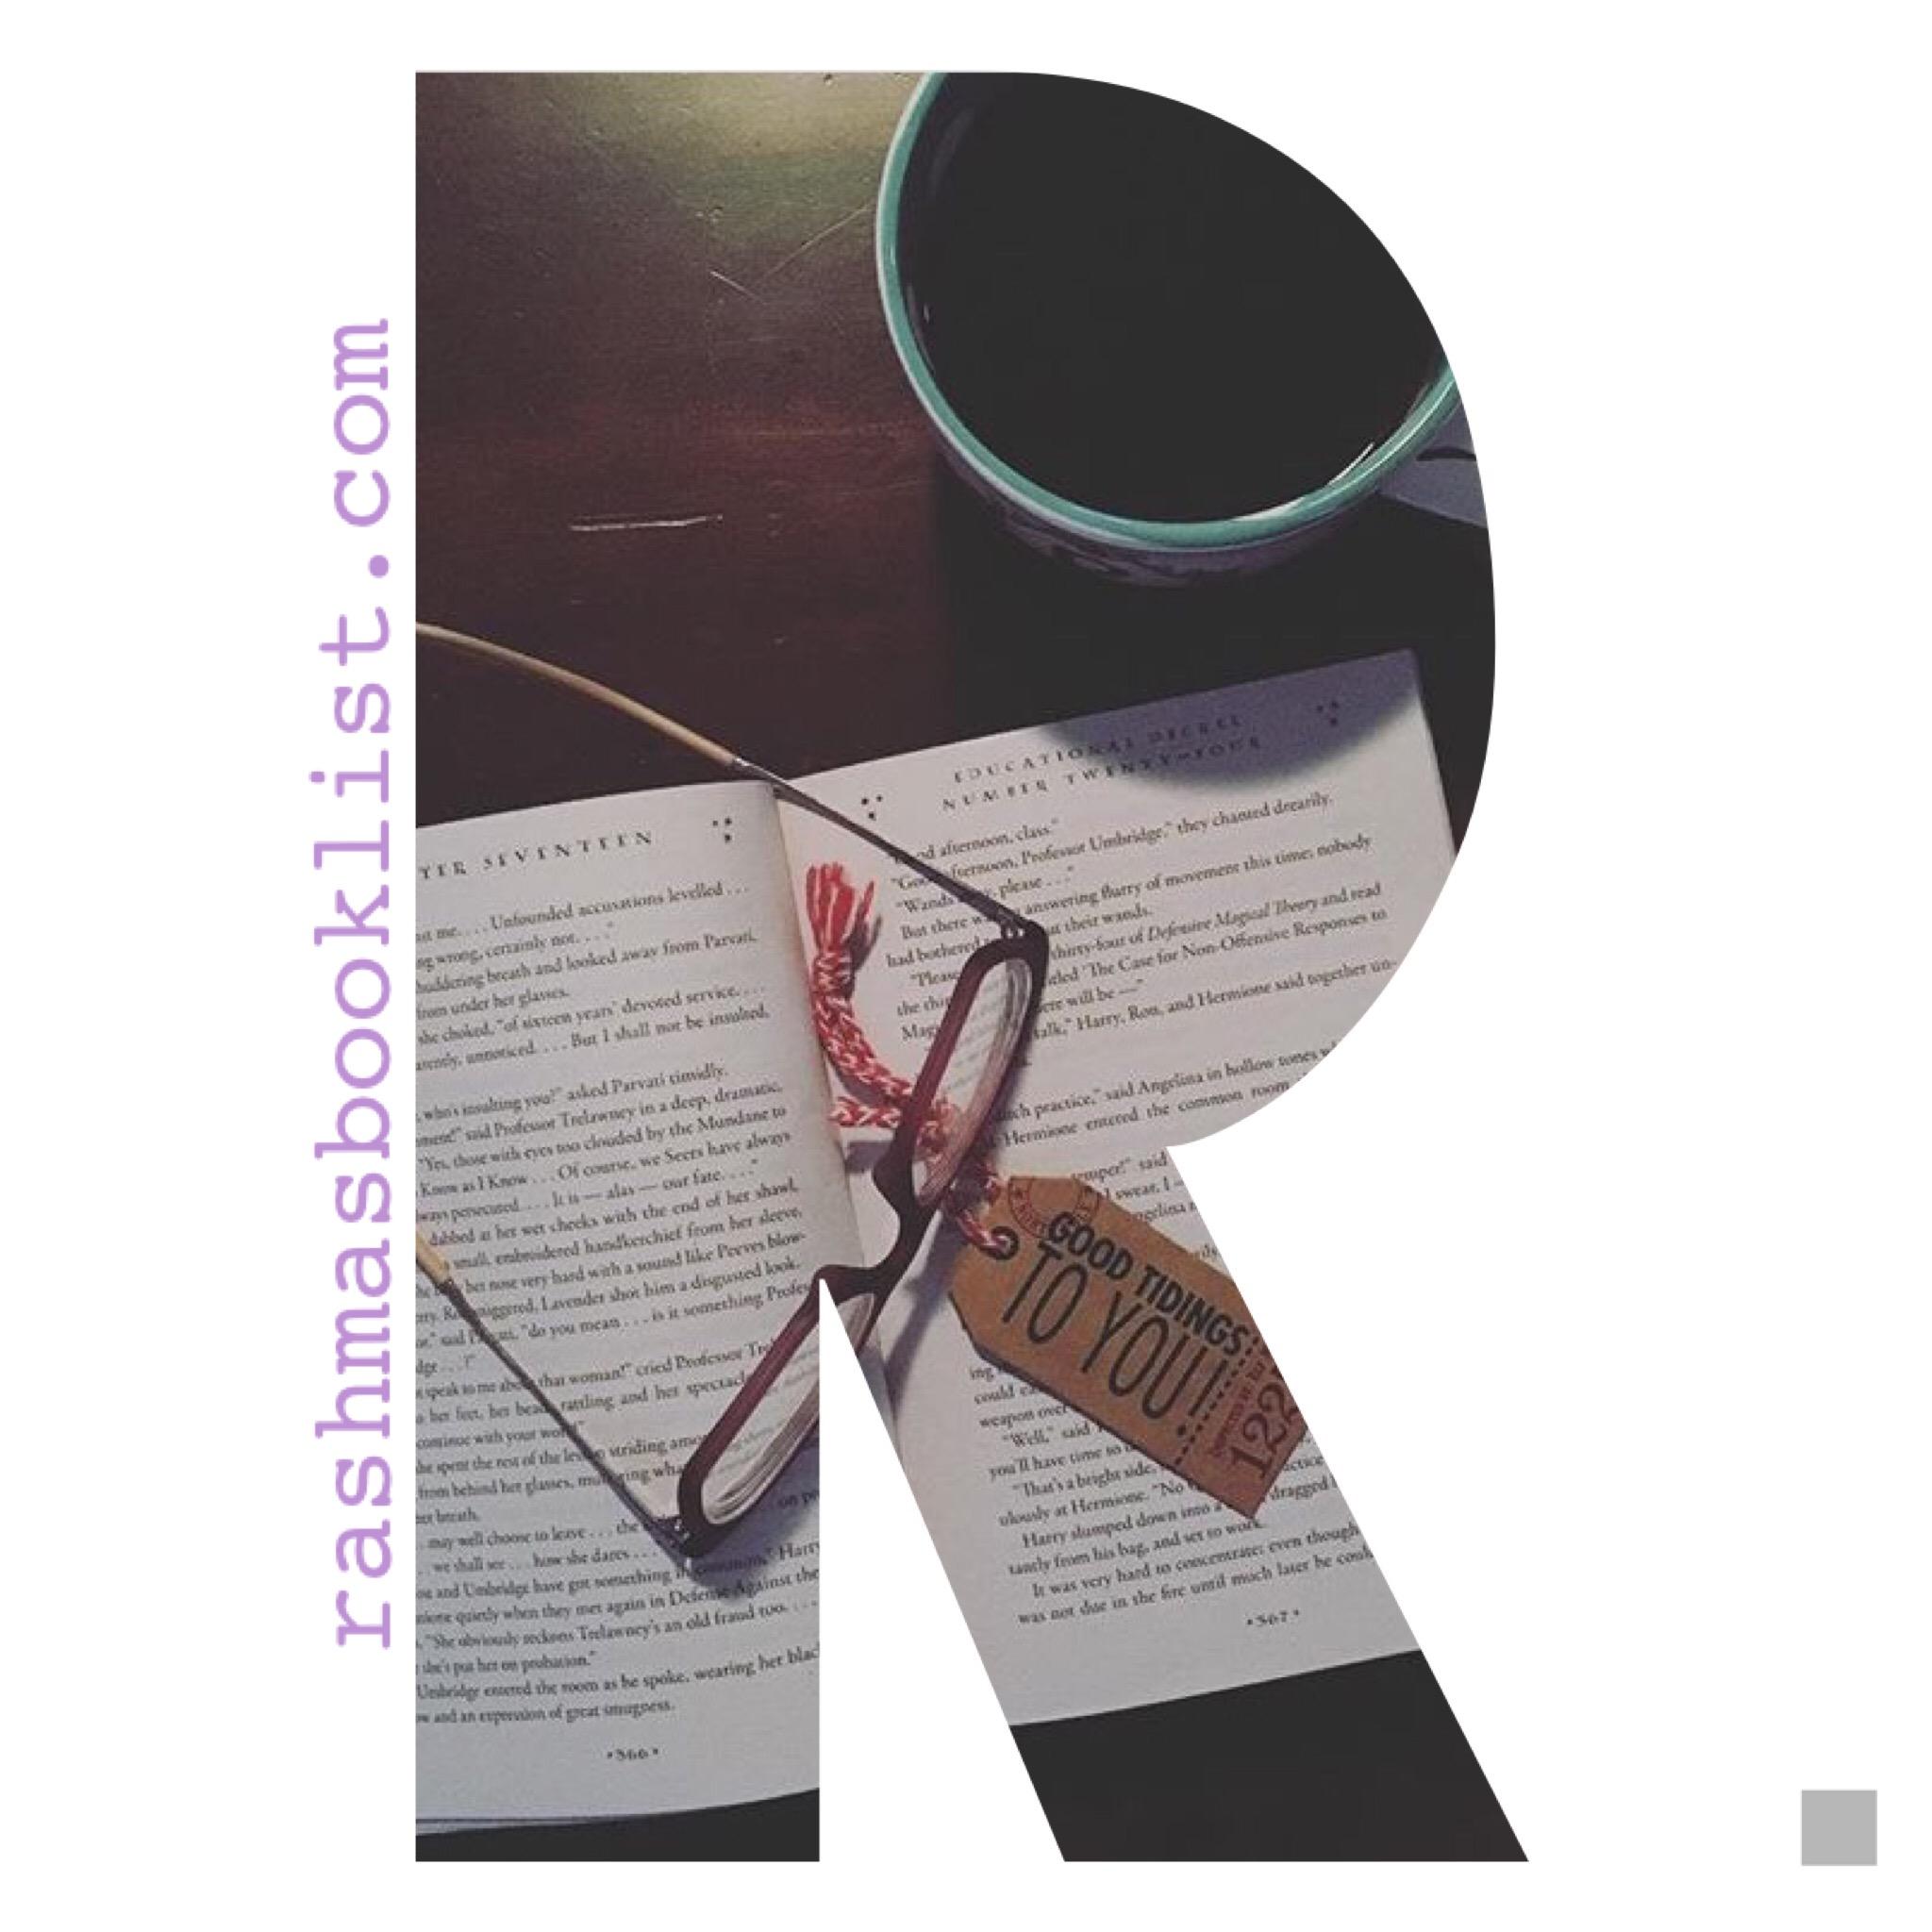 Rashma's Booklist